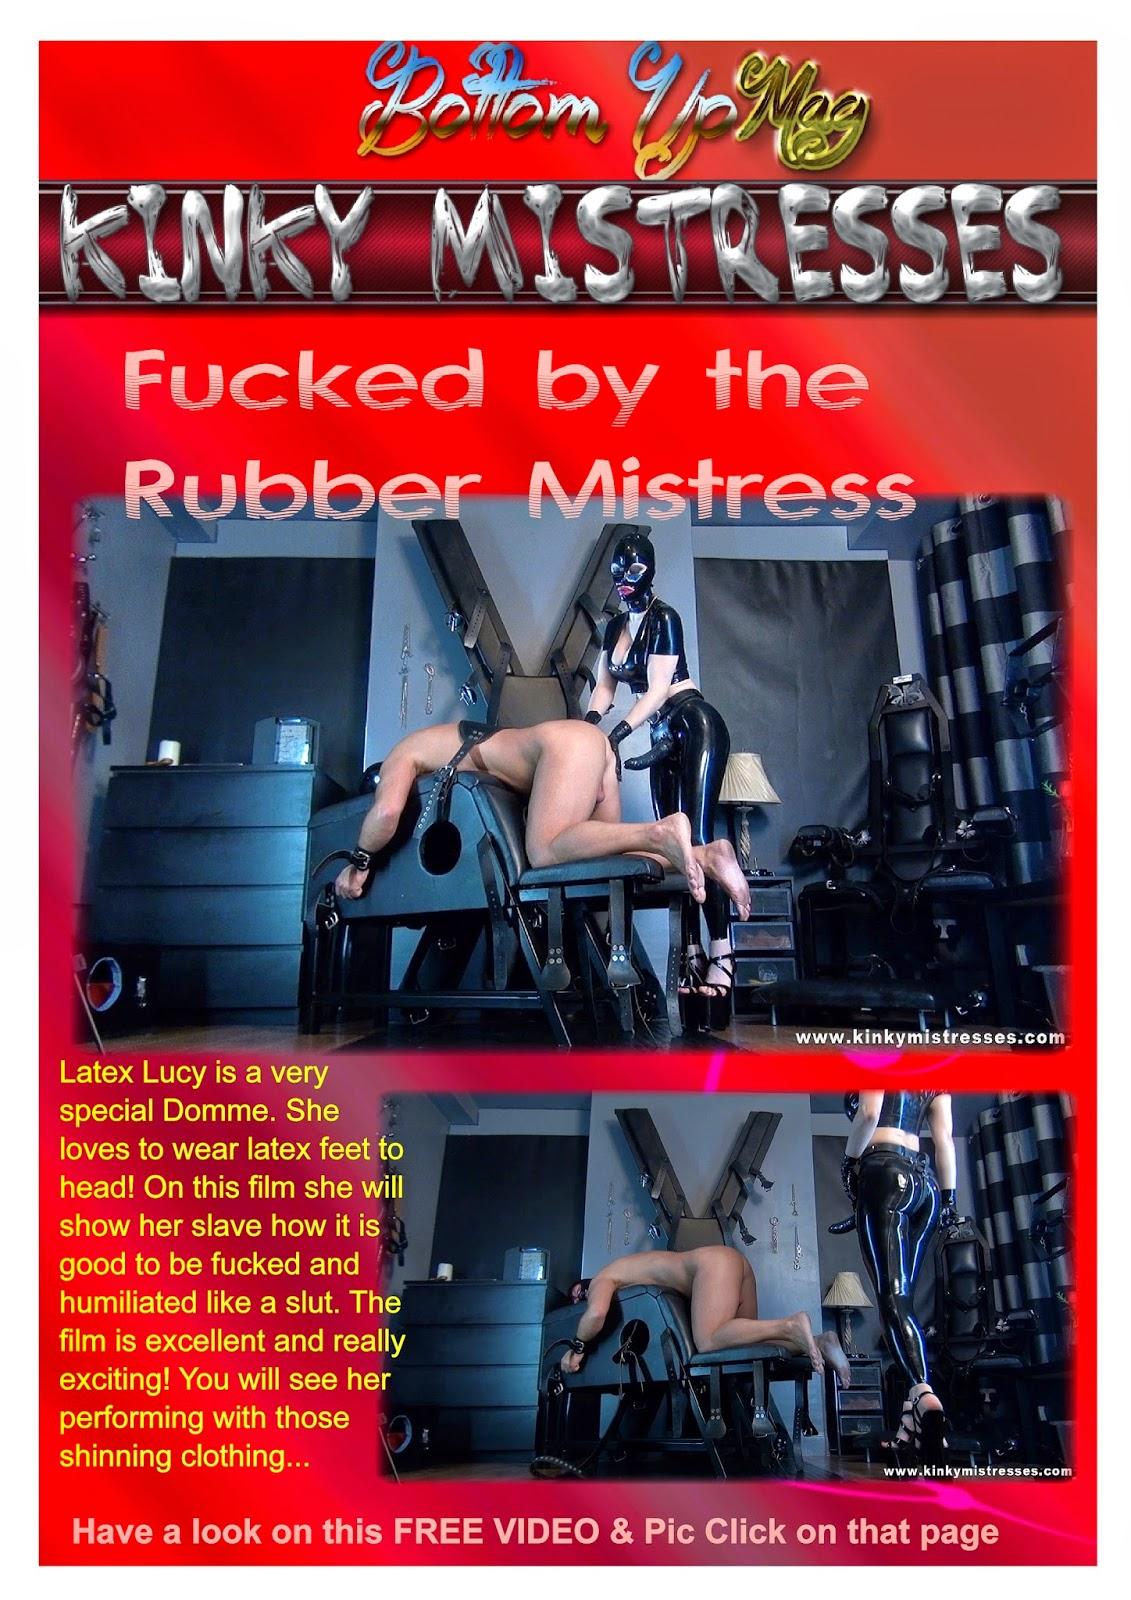 http://www.kinkymistresses.com/affiliate/promo/5d31f3/1/883/774138/